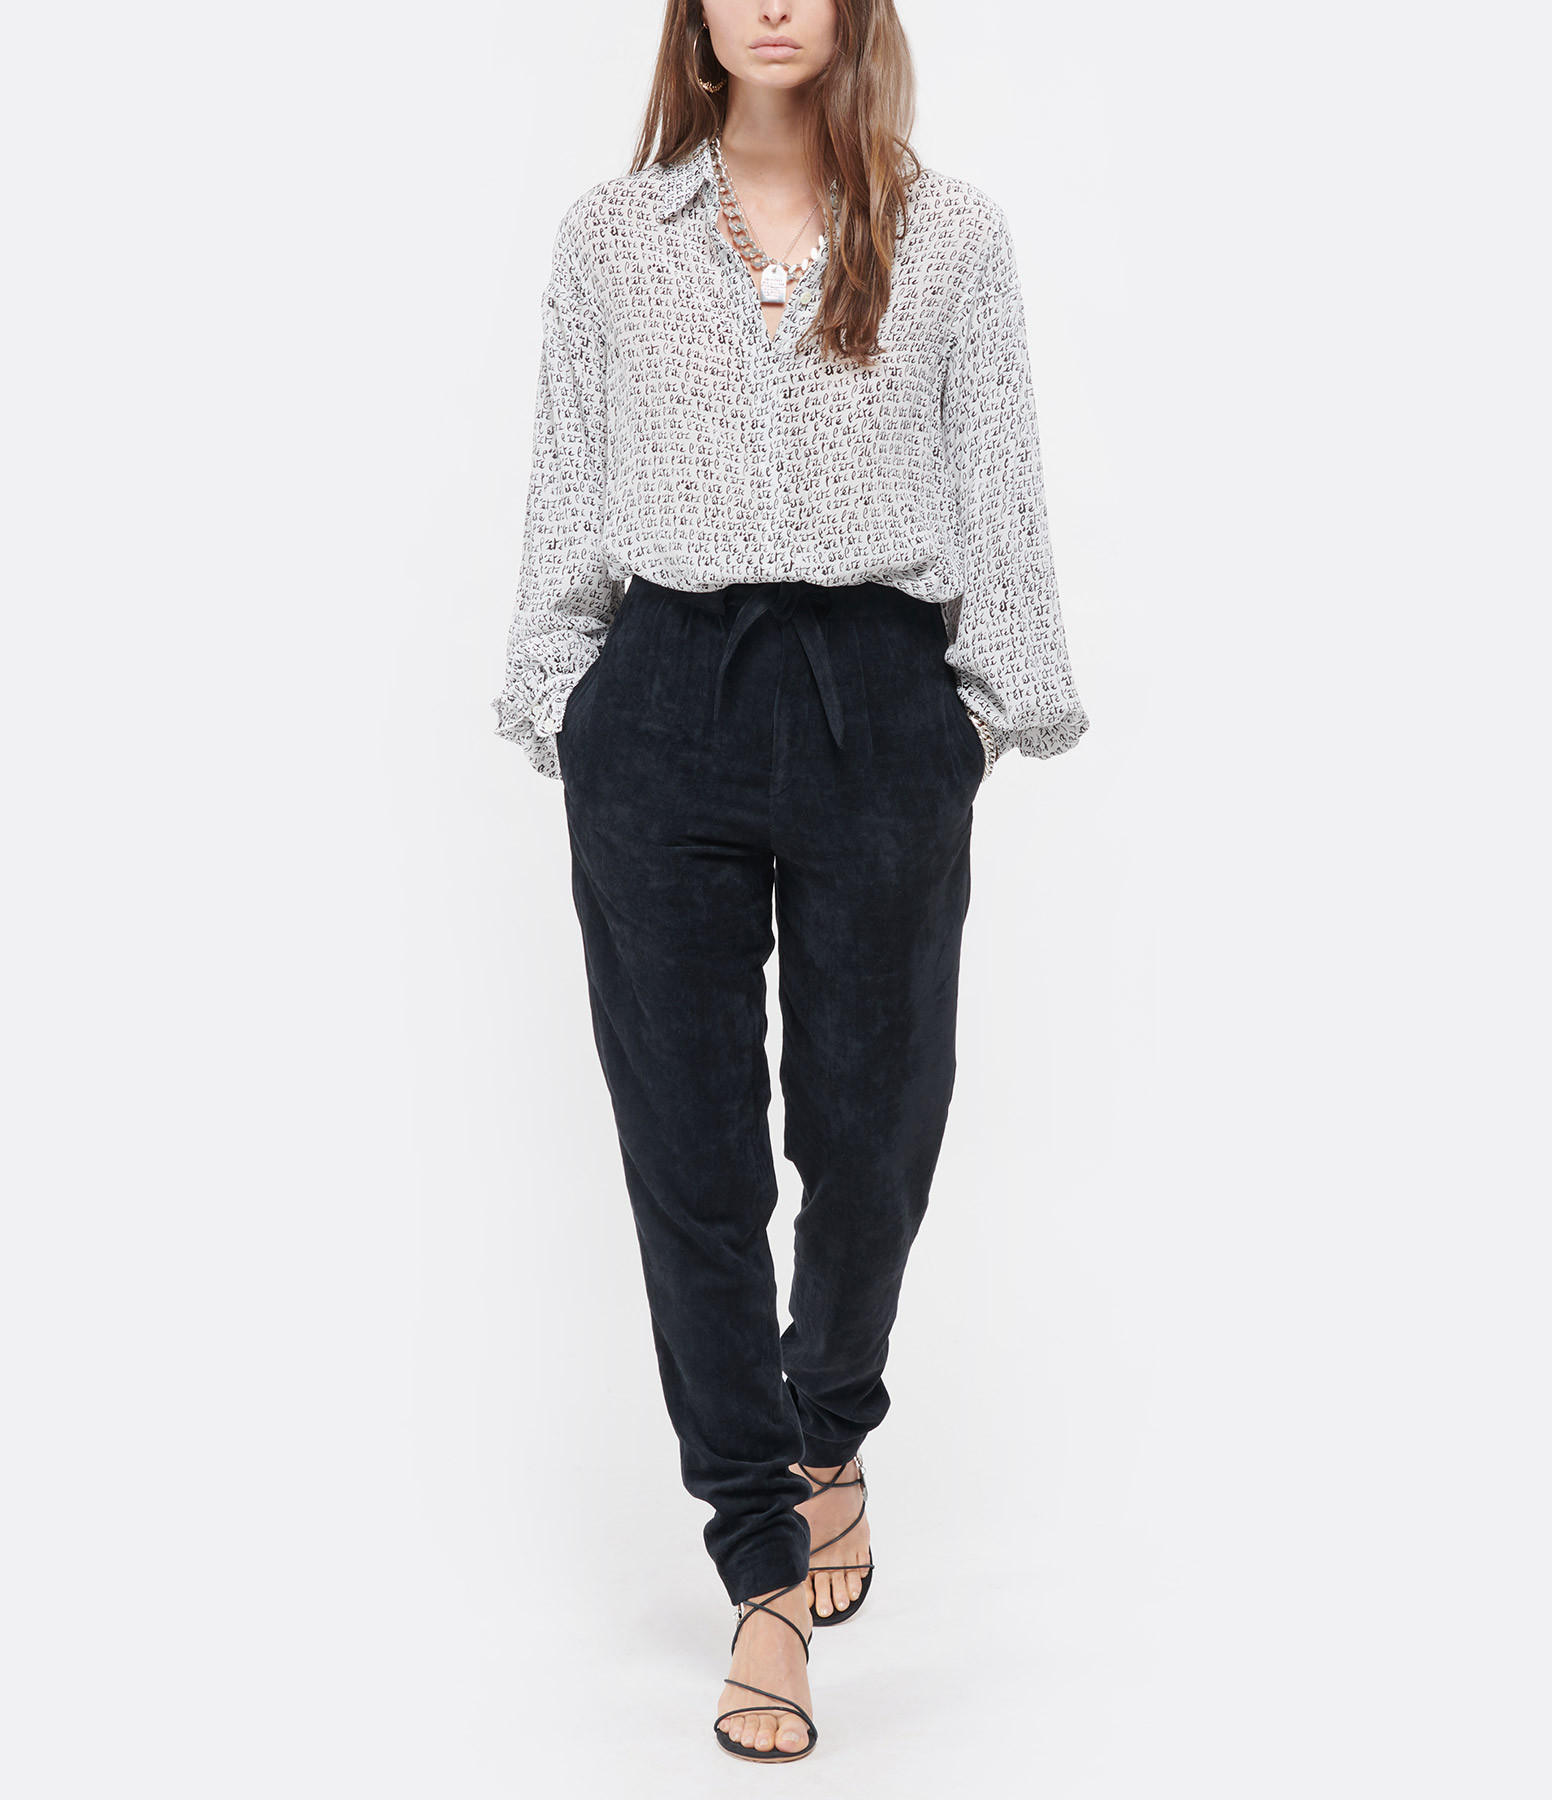 ISABEL MARANT - Pantalon Vilardo Noir Délavé